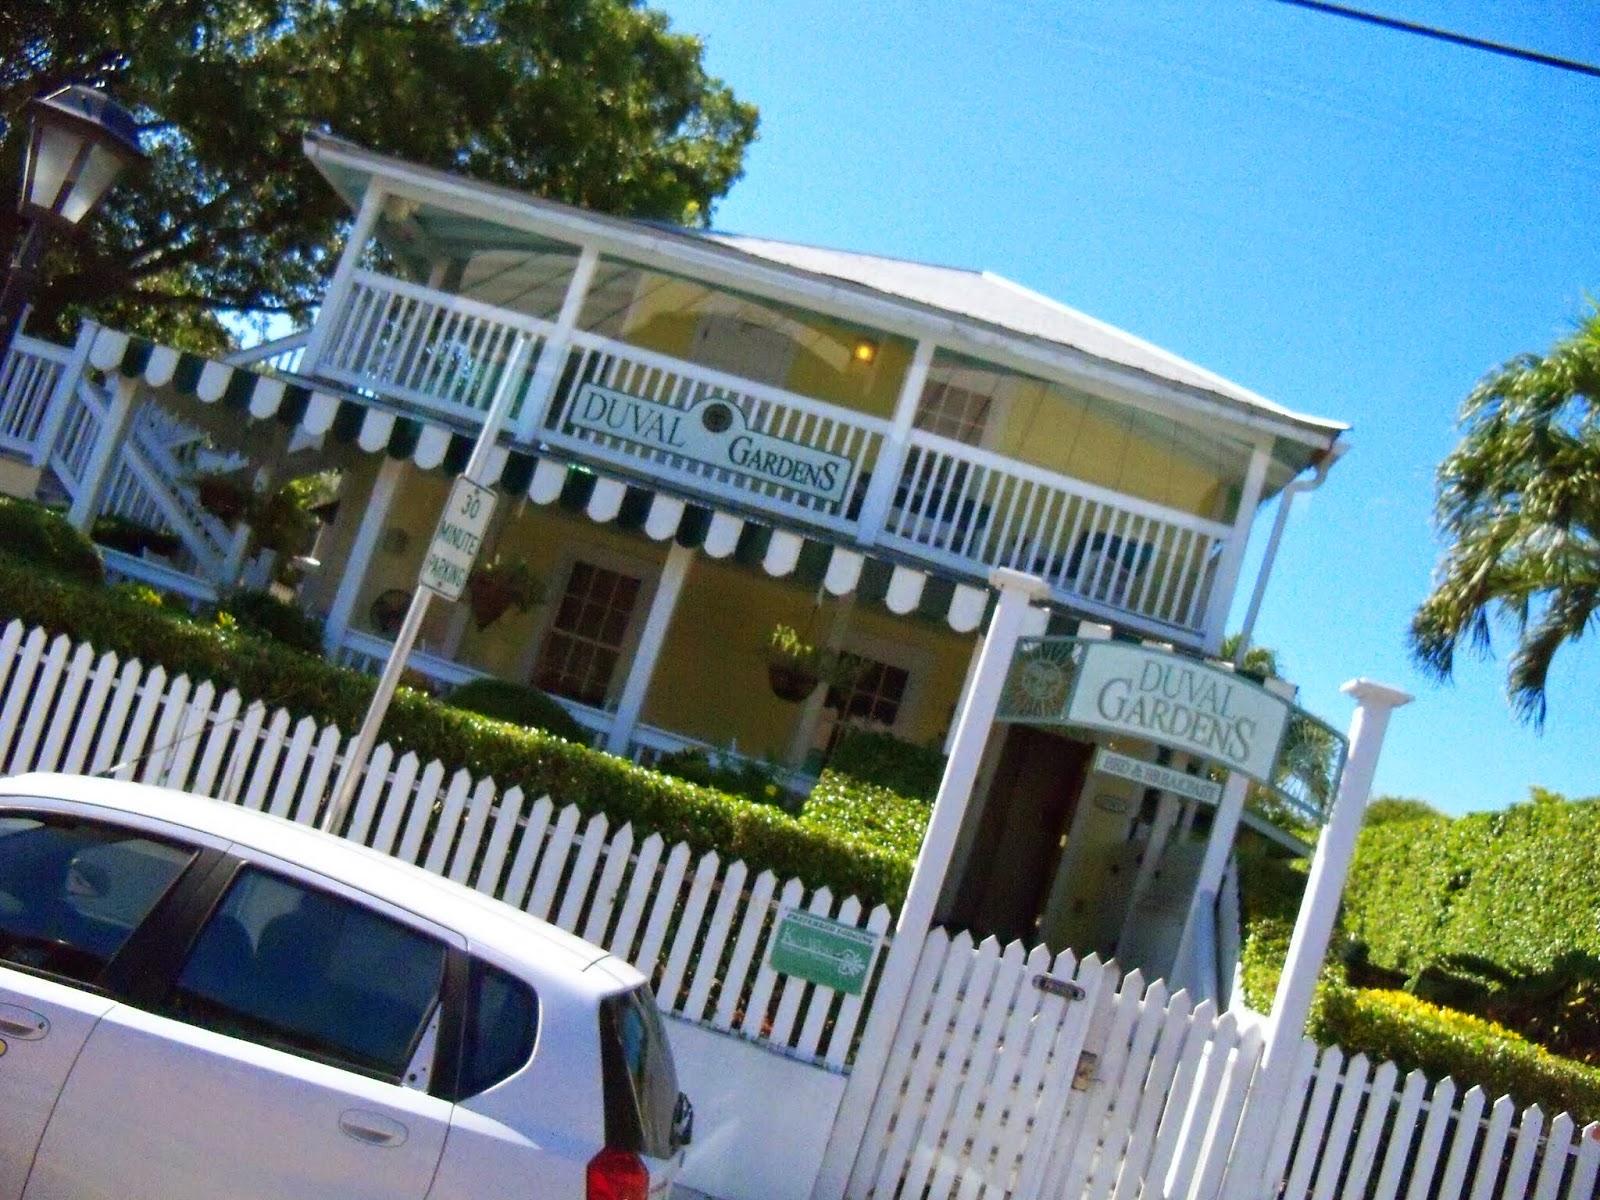 Key West Vacation - 116_5825.JPG